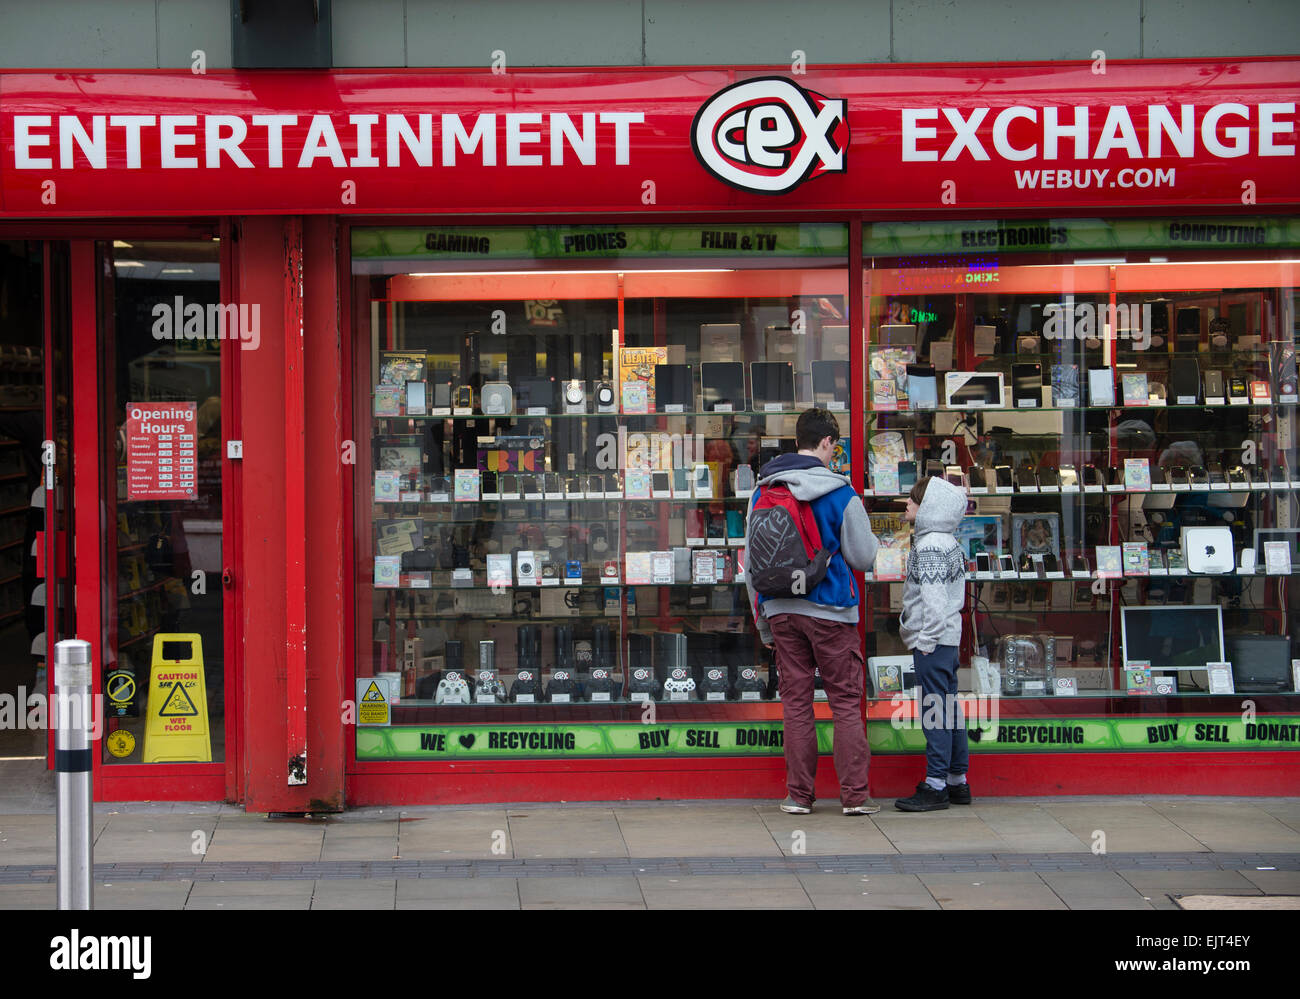 Entertainment Exchange (webuy.com) shop store Swansea Wales UK Photo Stock